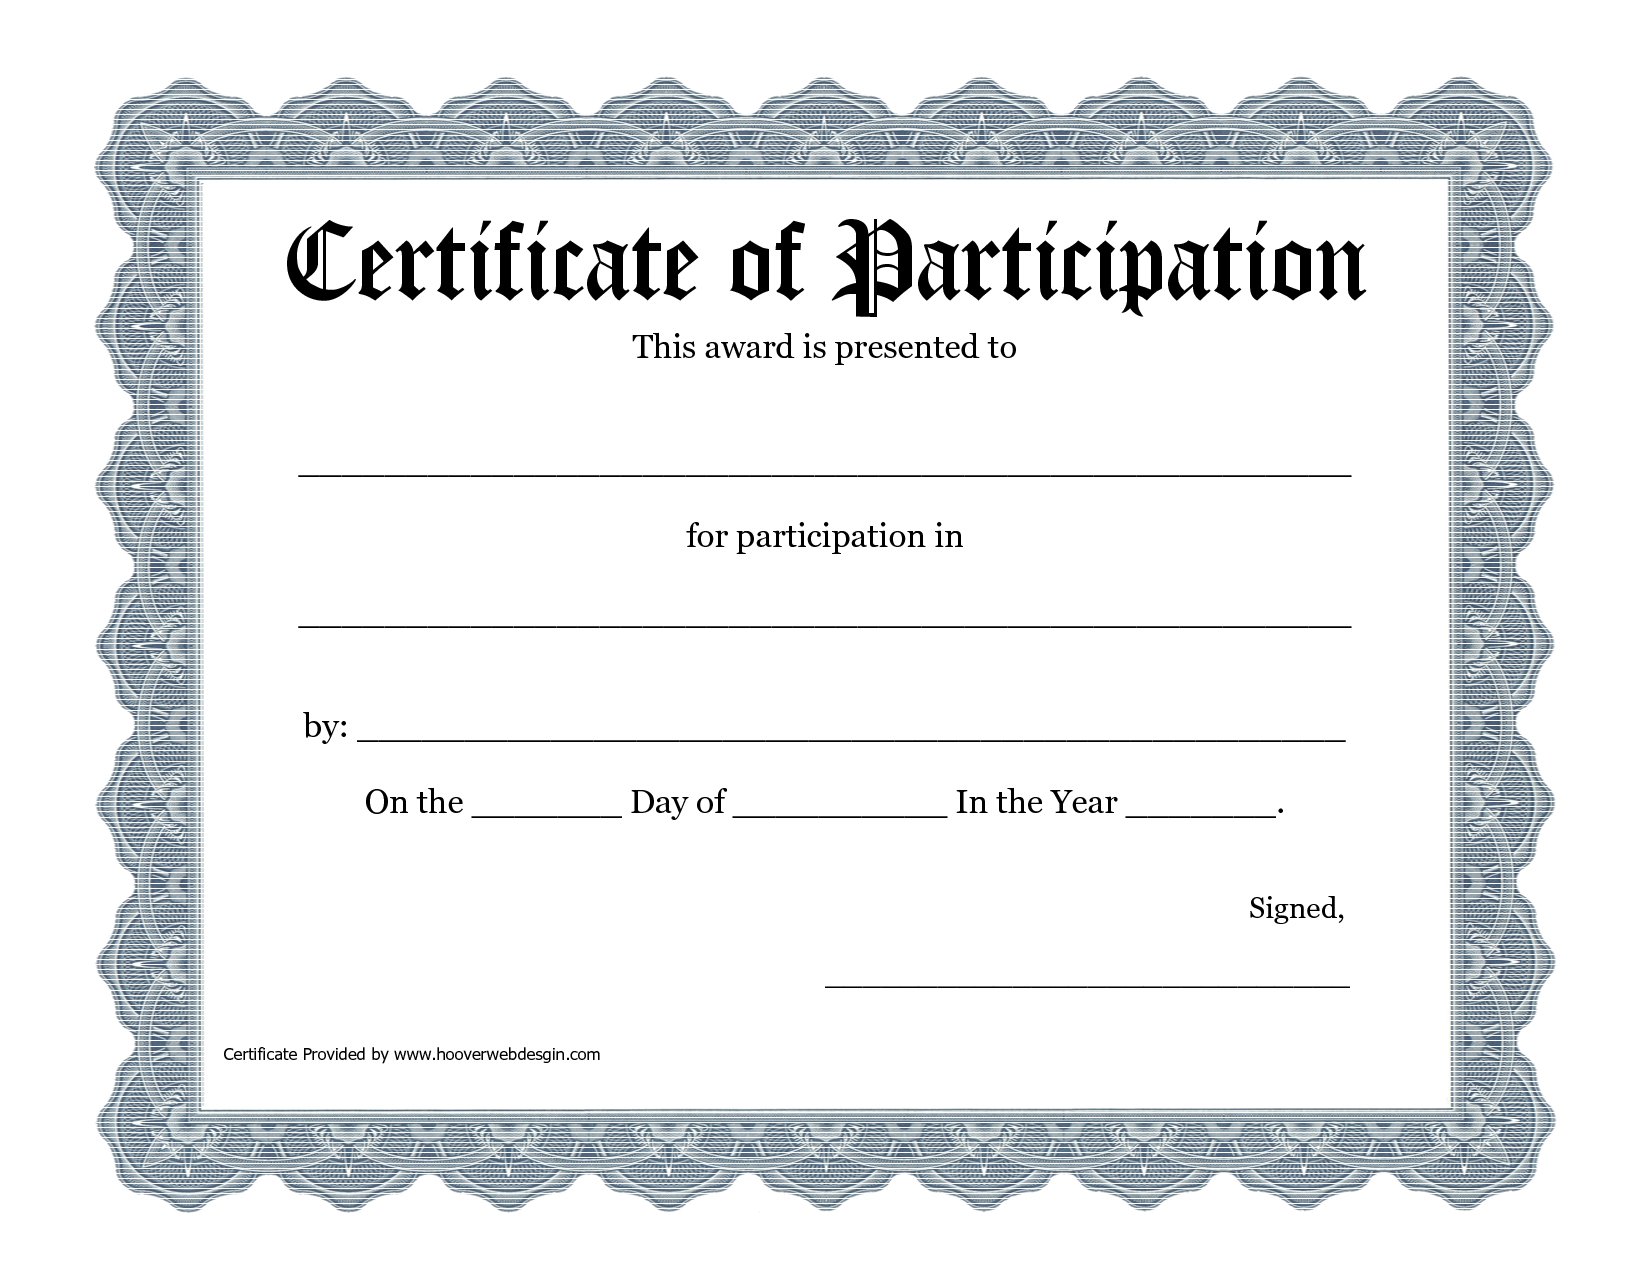 Free Printable Award Certificate Template - Bing Images | 2016 Art - Commitment Certificate Free Printable